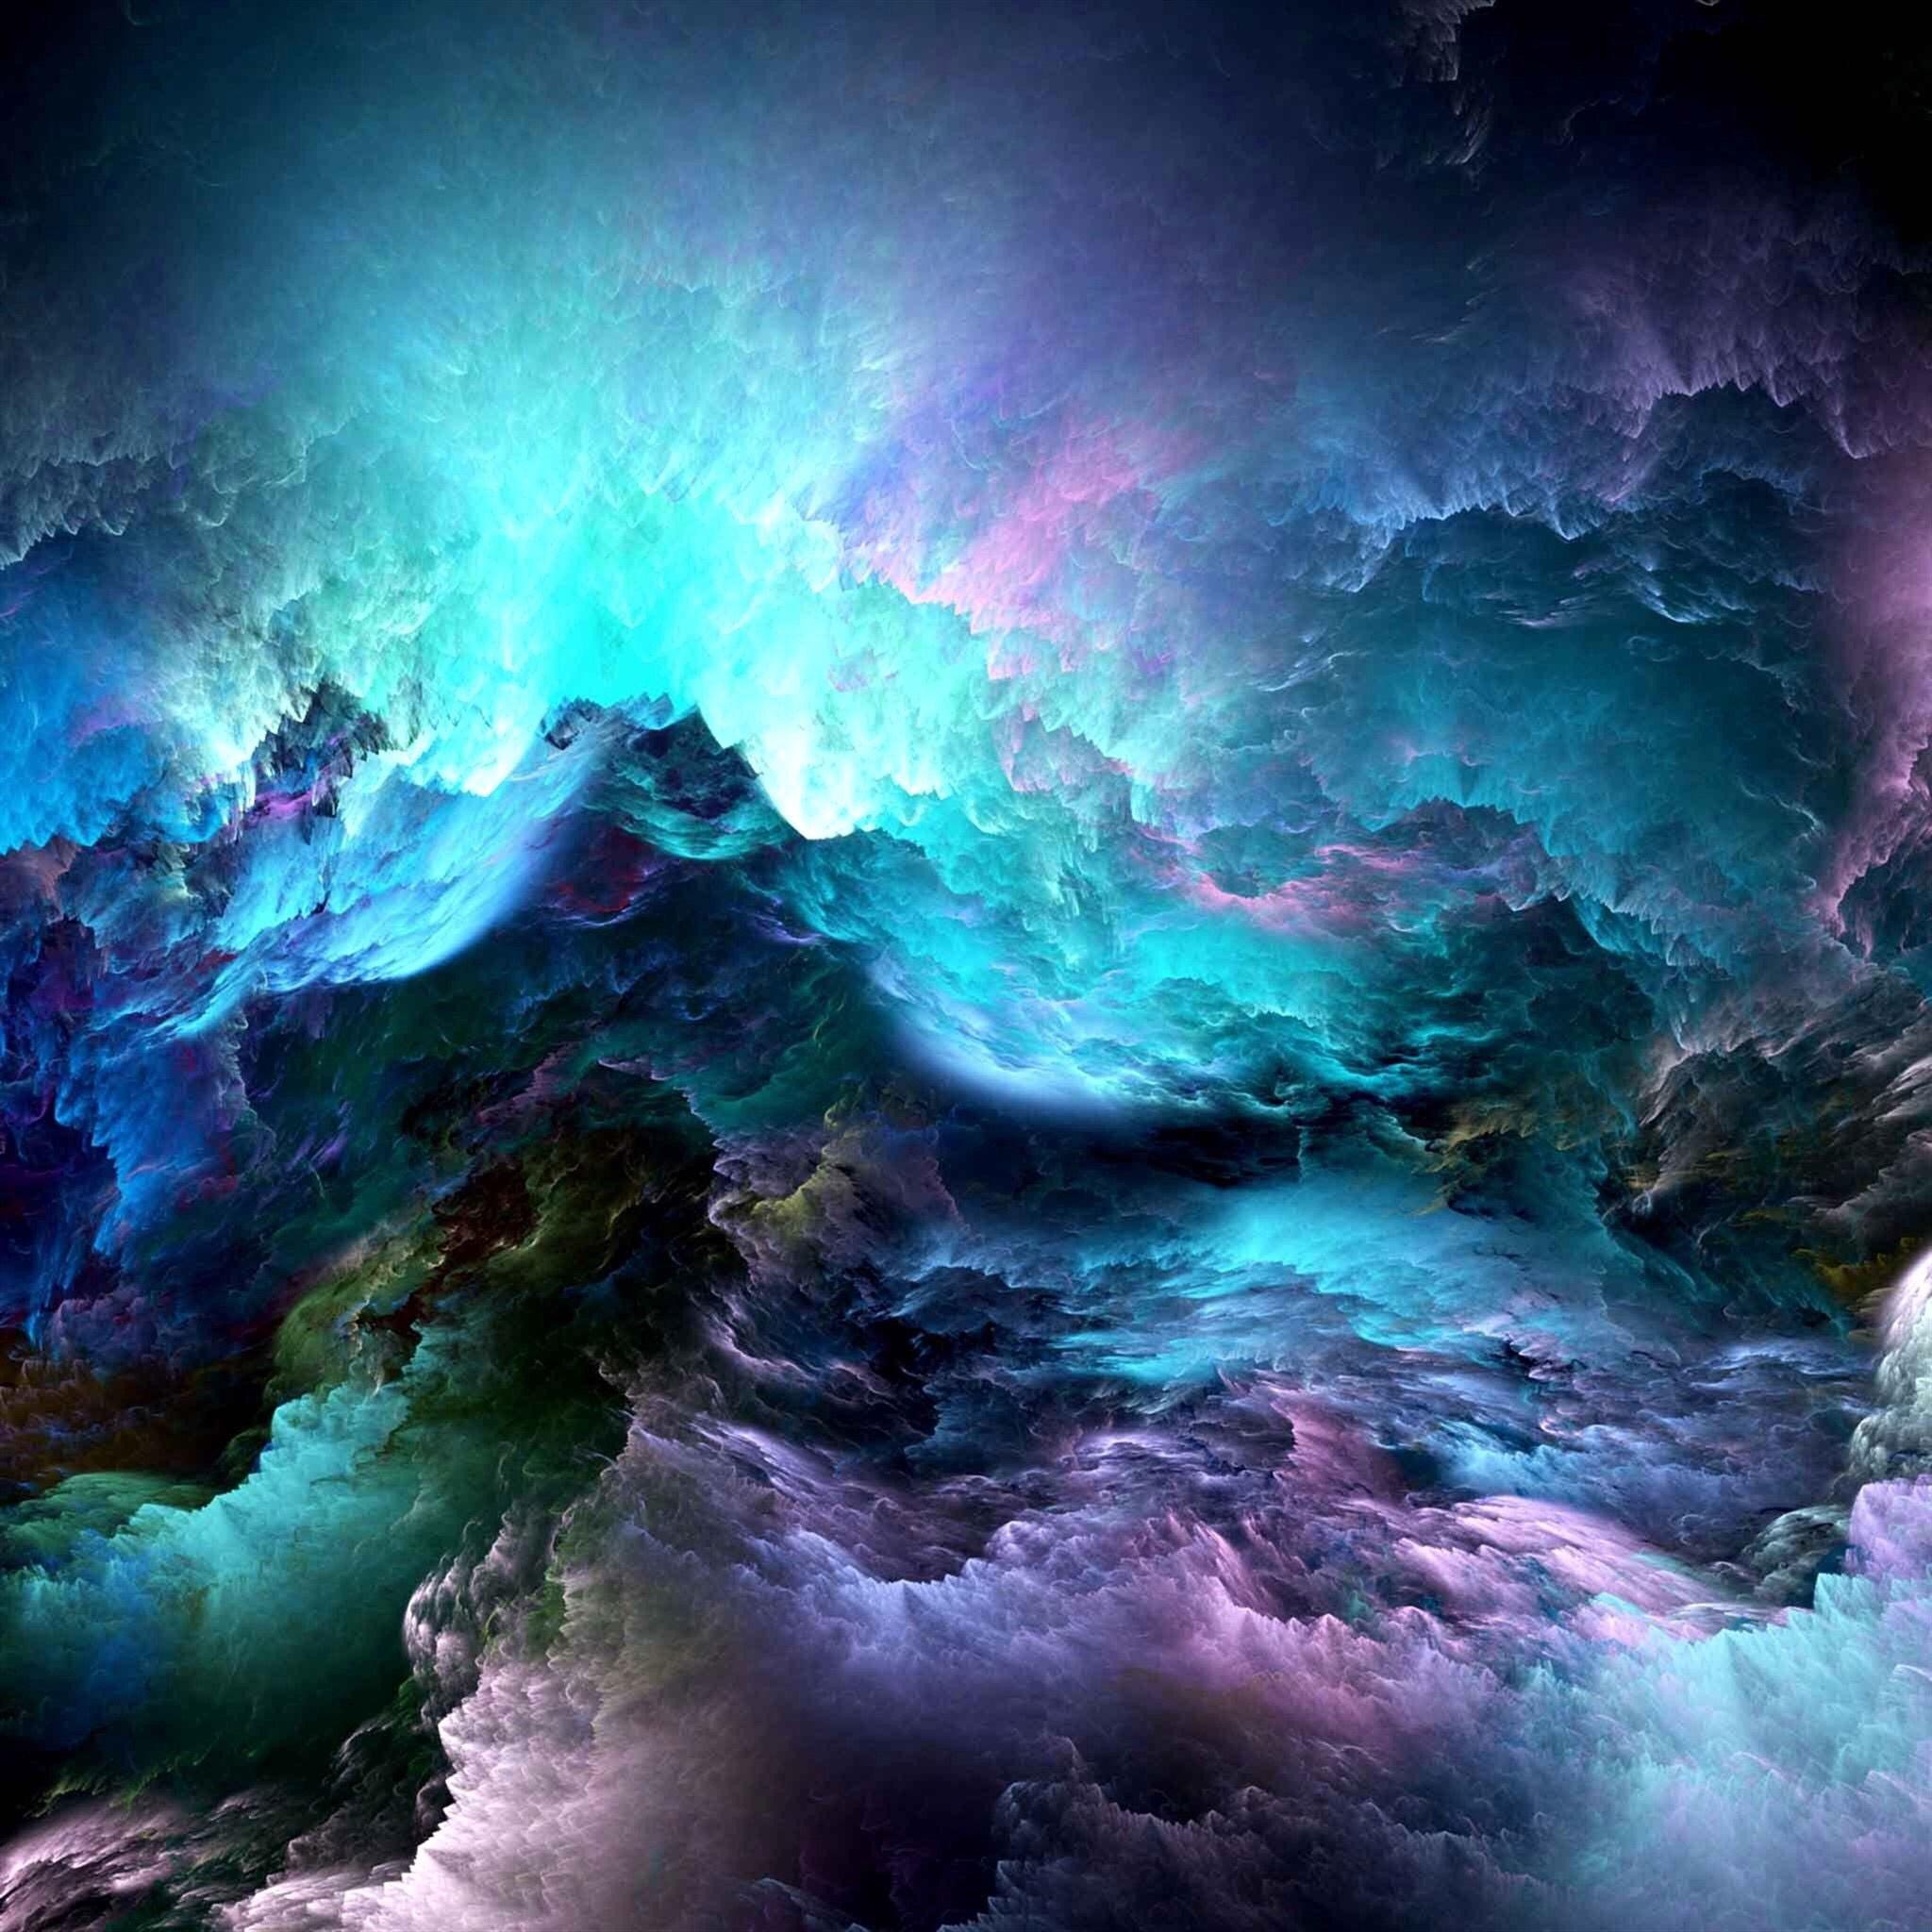 Cool galaxy wallpaper galaxy pinterest - Cool galaxy wallpaper ...